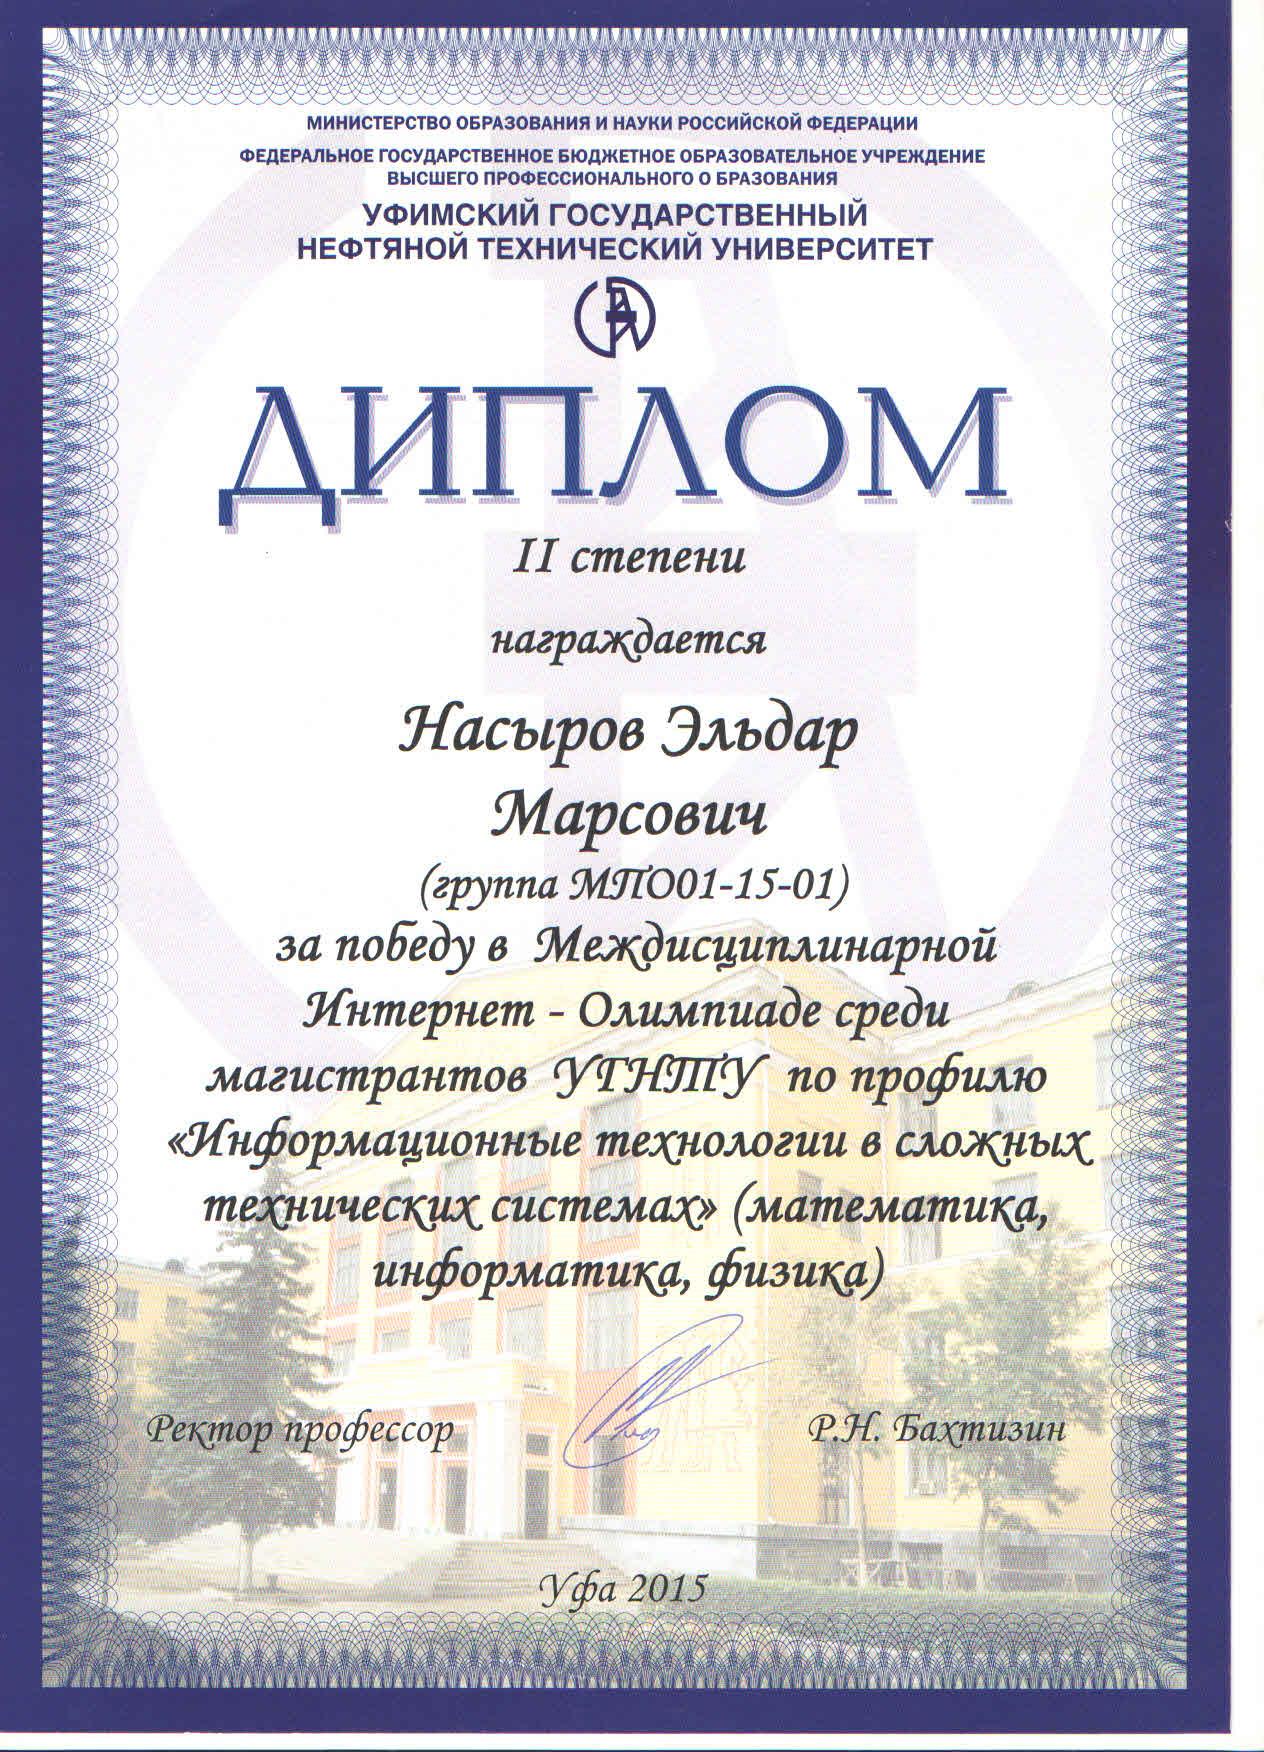 Насыров Эльдар (МПО01-15-01), #КафедраВТИК, #ФАПП, #ВТИК, #УГНТУ